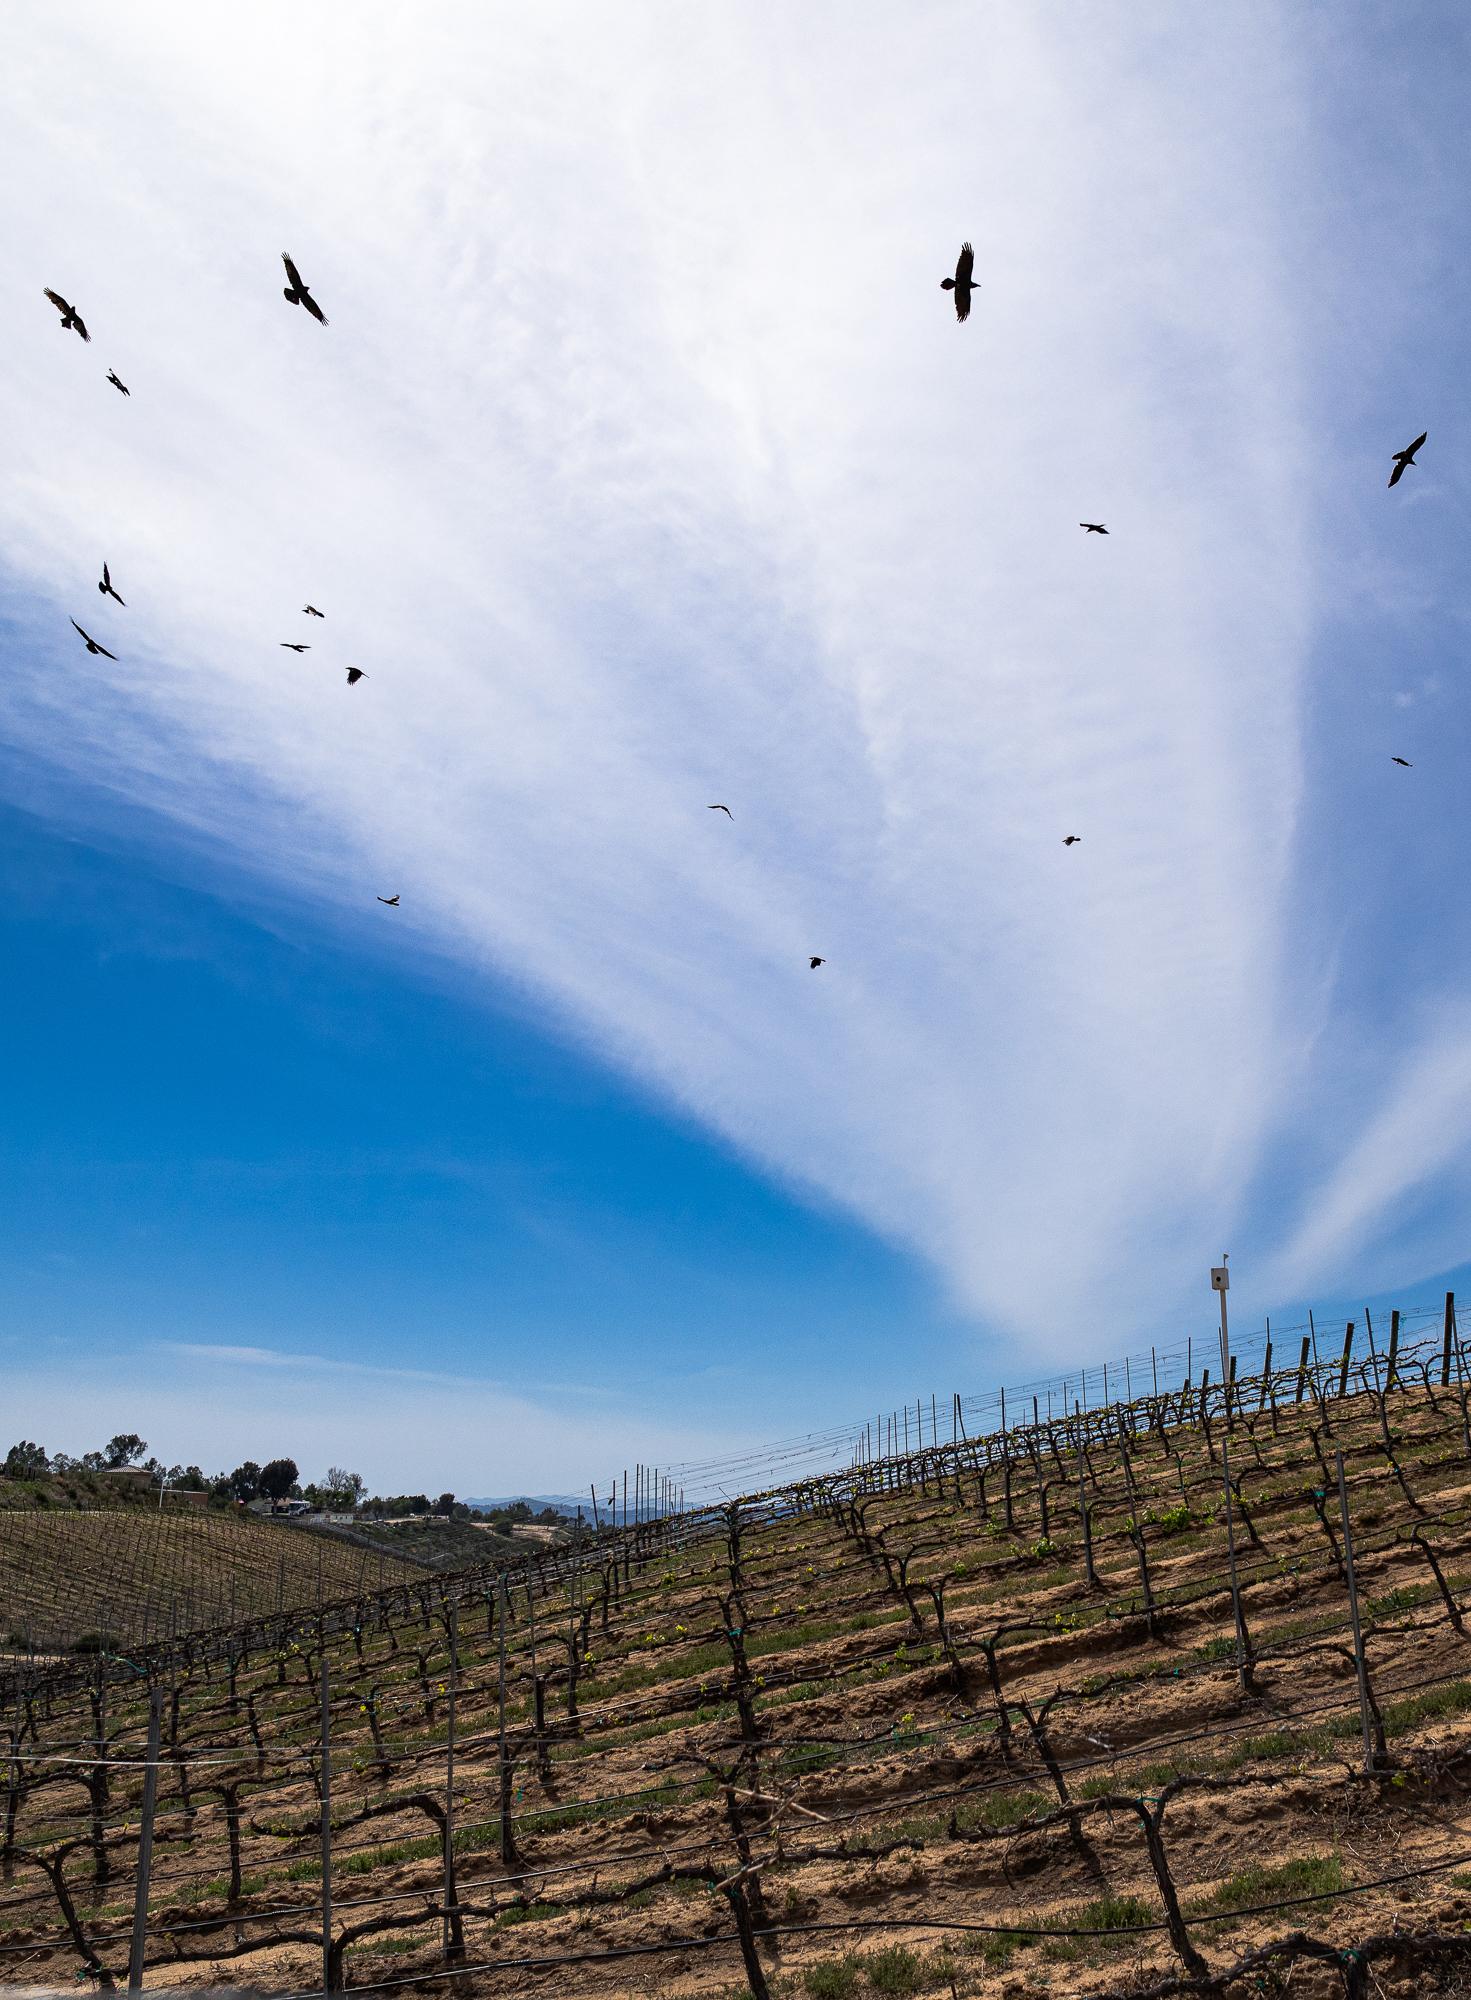 Ravens Circling a Dormant Vineyard in Temecula, CA